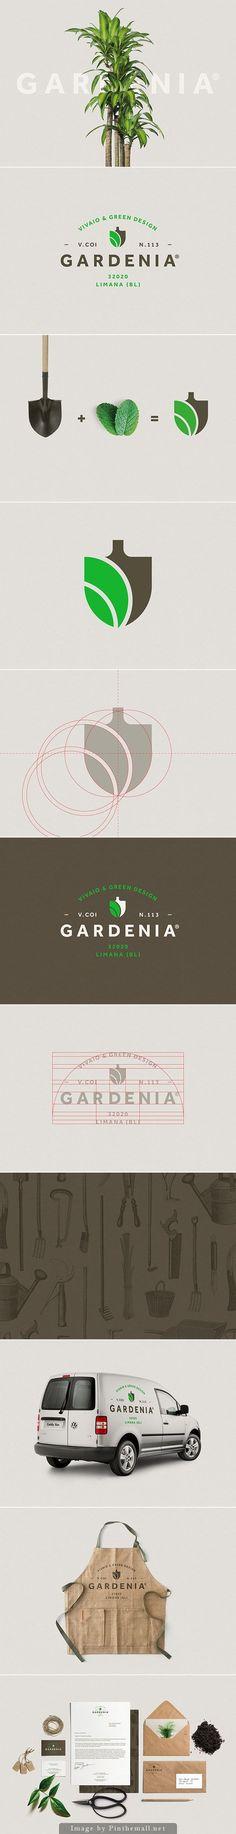 Gardenia identity by Luca Fontana // Creación de un logo simple que expresa fácilmente su propósito. Corporate Design, Brand Identity Design, Graphic Design Branding, Design Graphique, Art Graphique, Web Design, Modern Design, Design Art, Business Branding